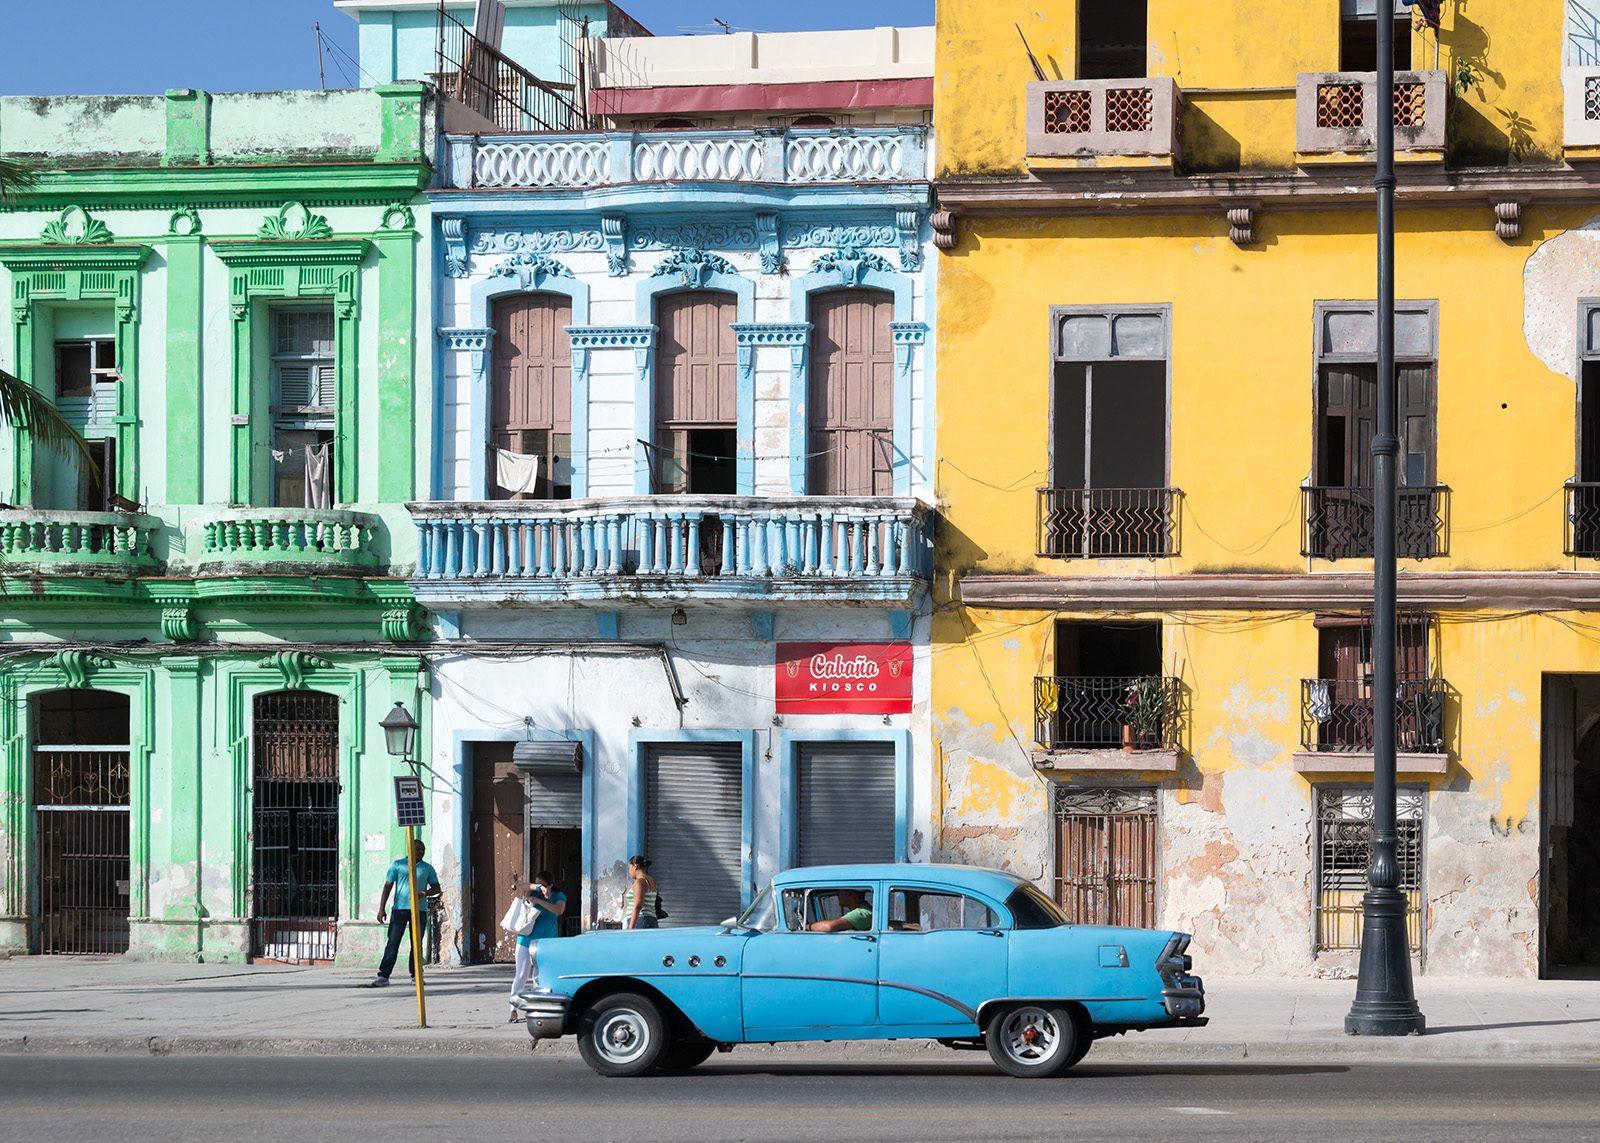 Typisk Havana av Erling Maartmann-Moe